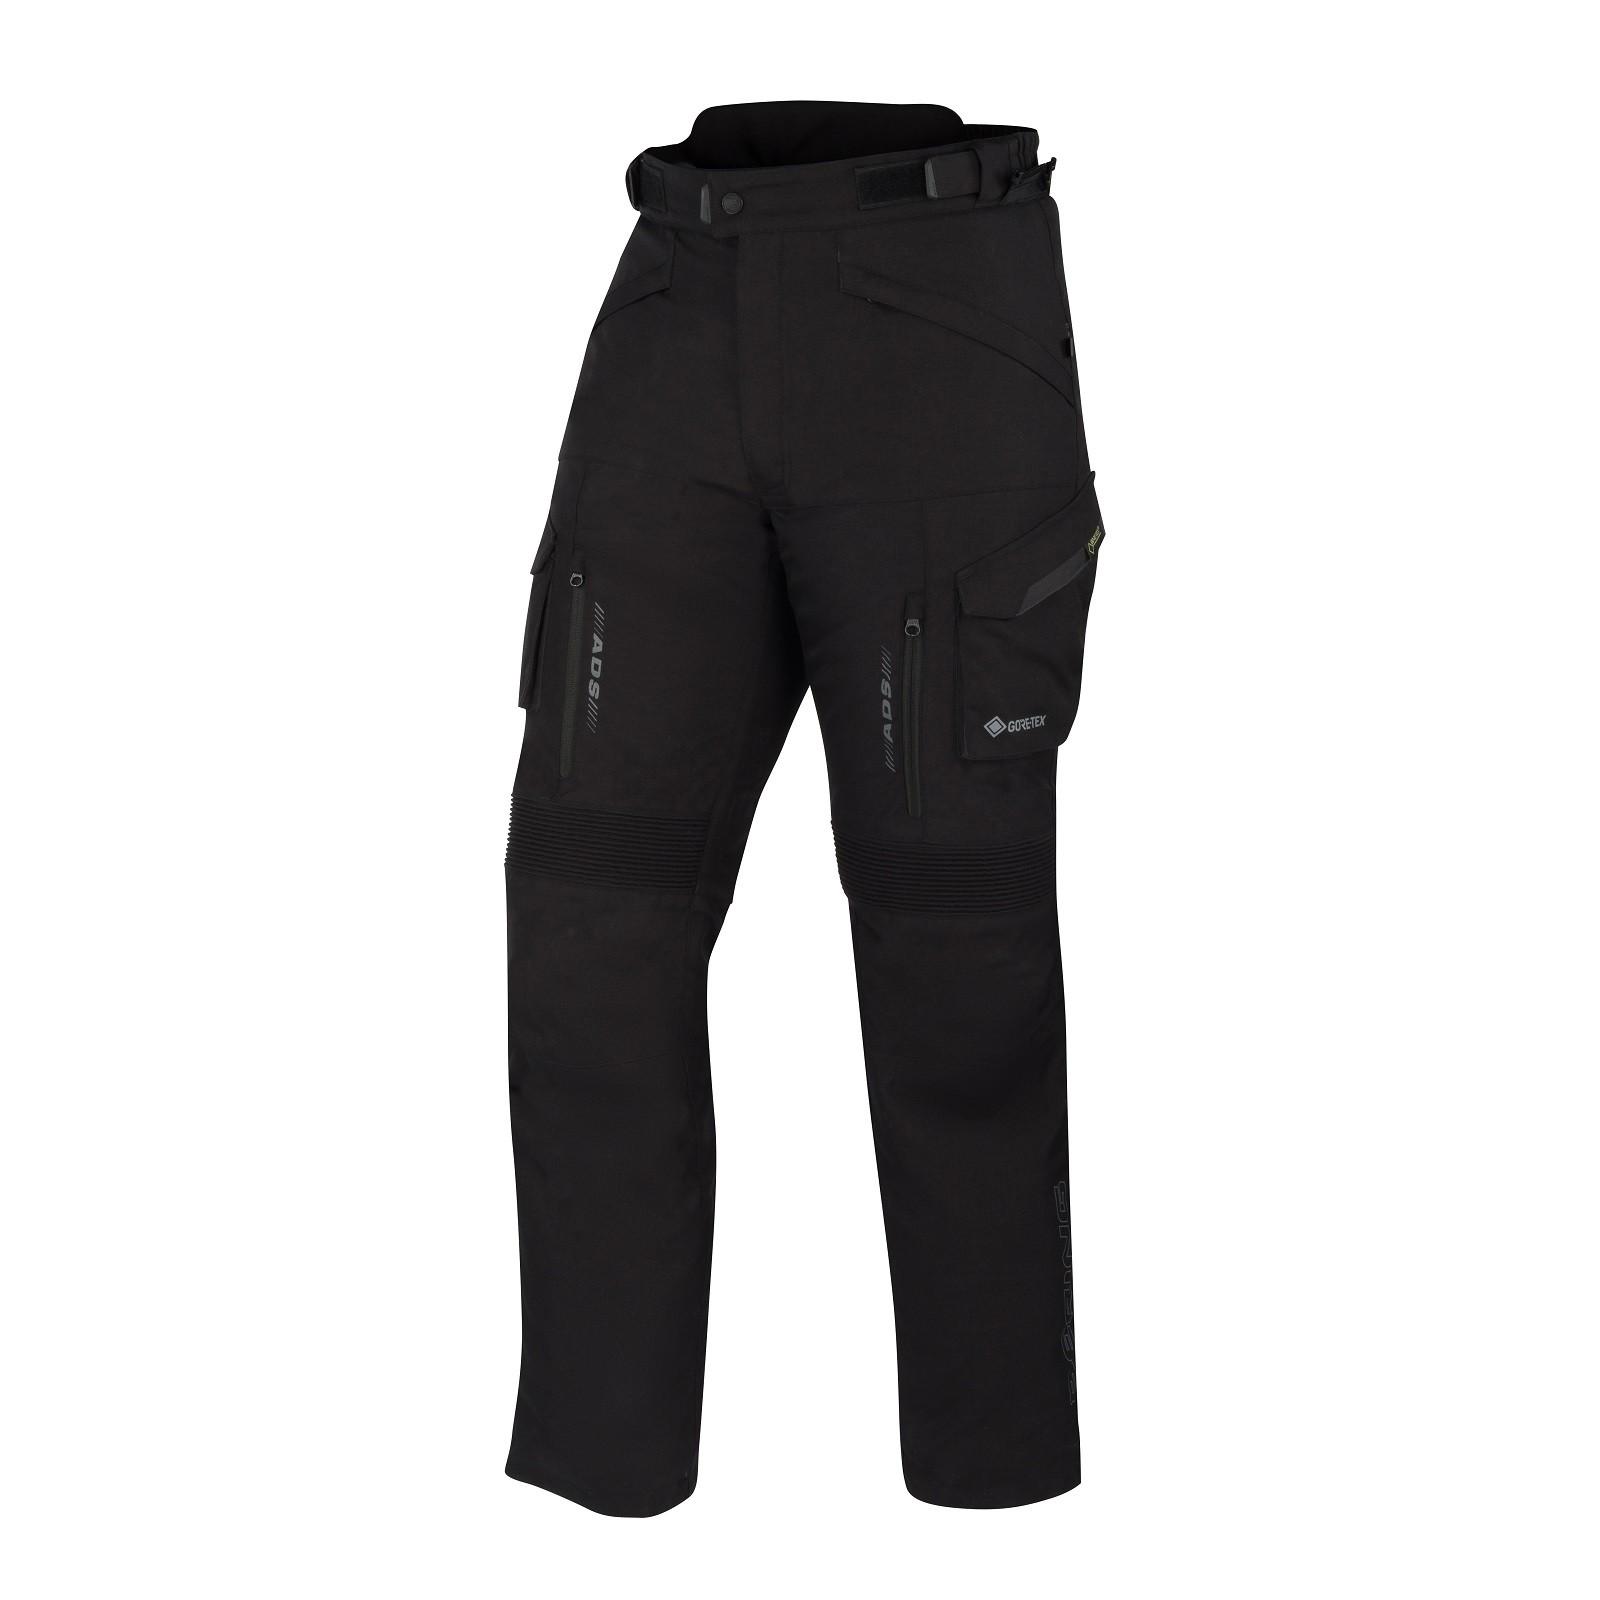 Pantalon MINSK Noir / BTP460